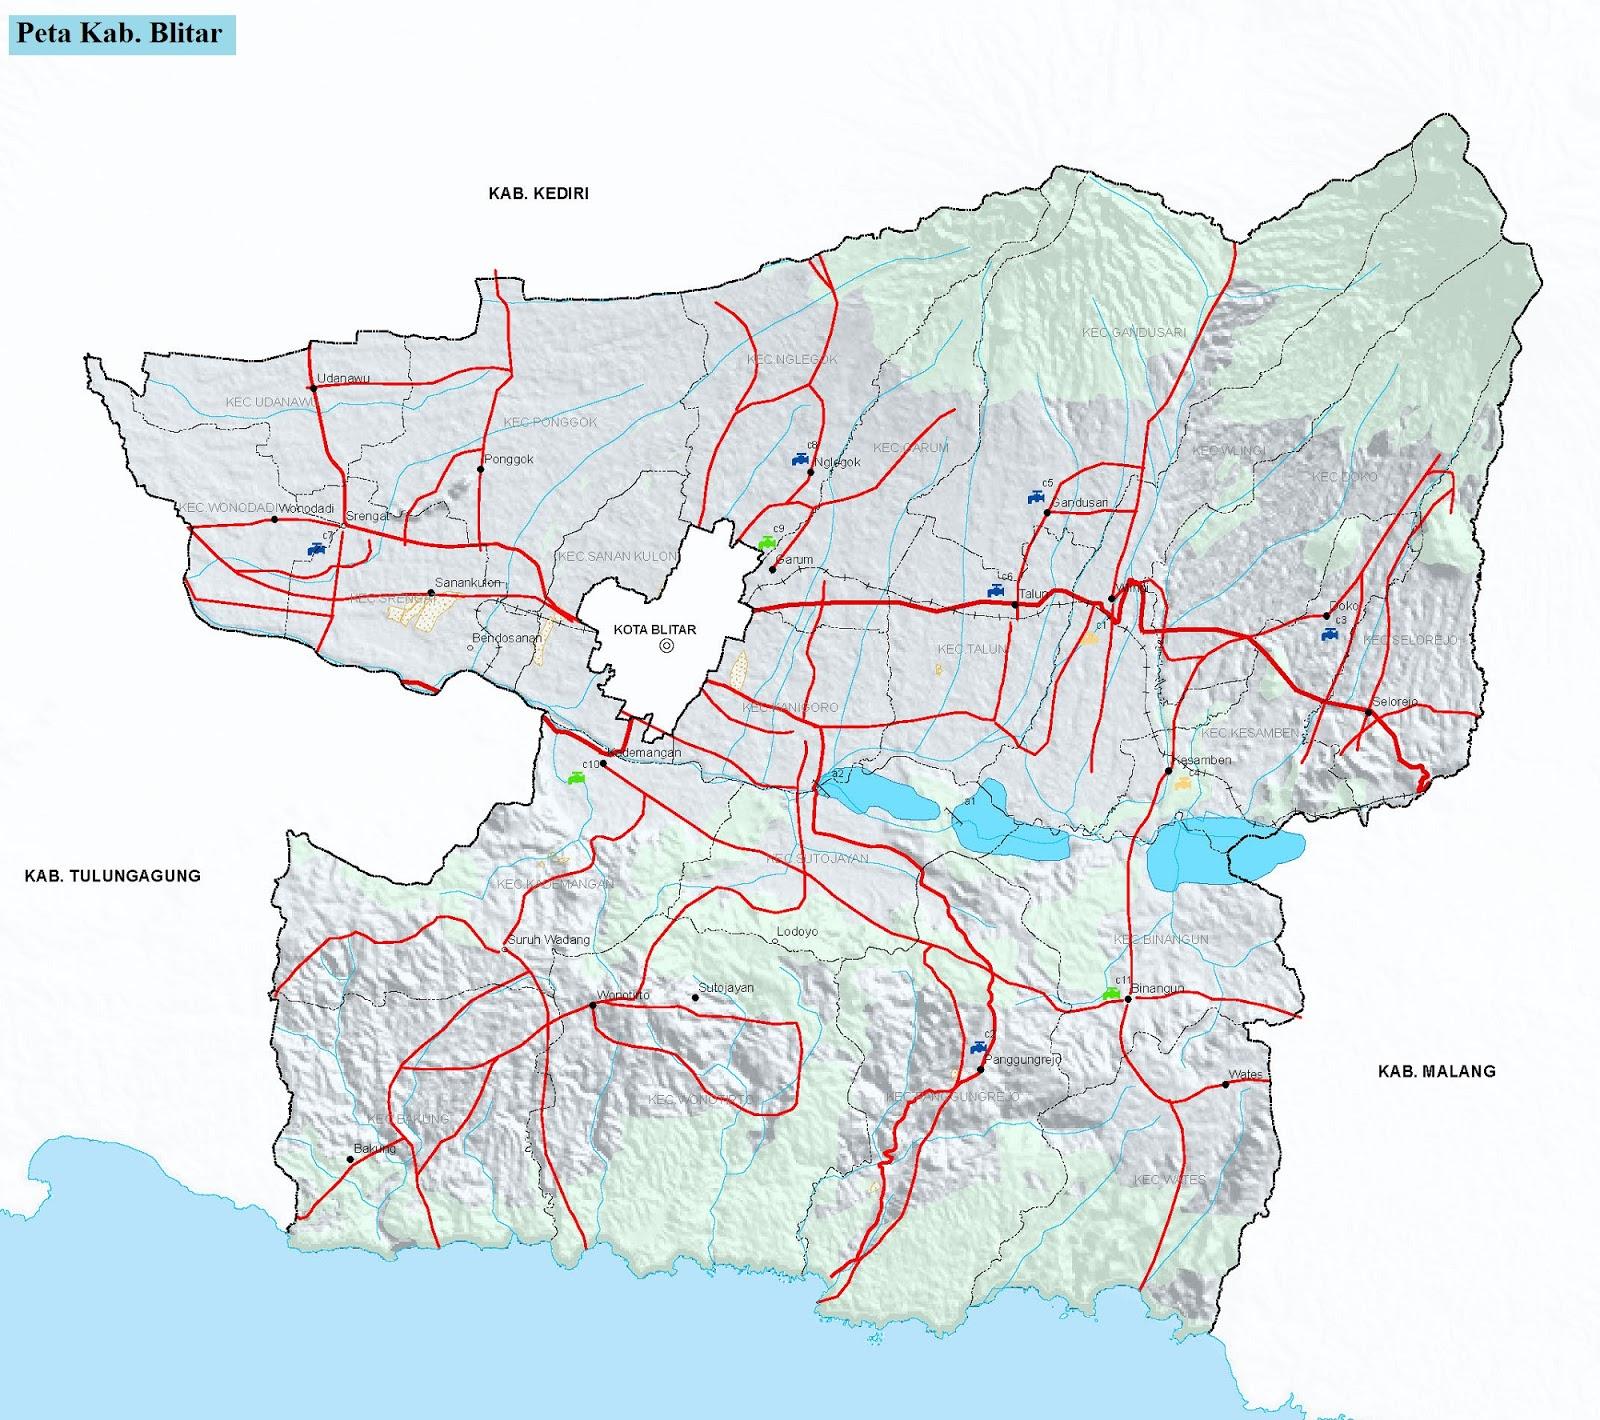 Peta Kabupaten Blitar HD